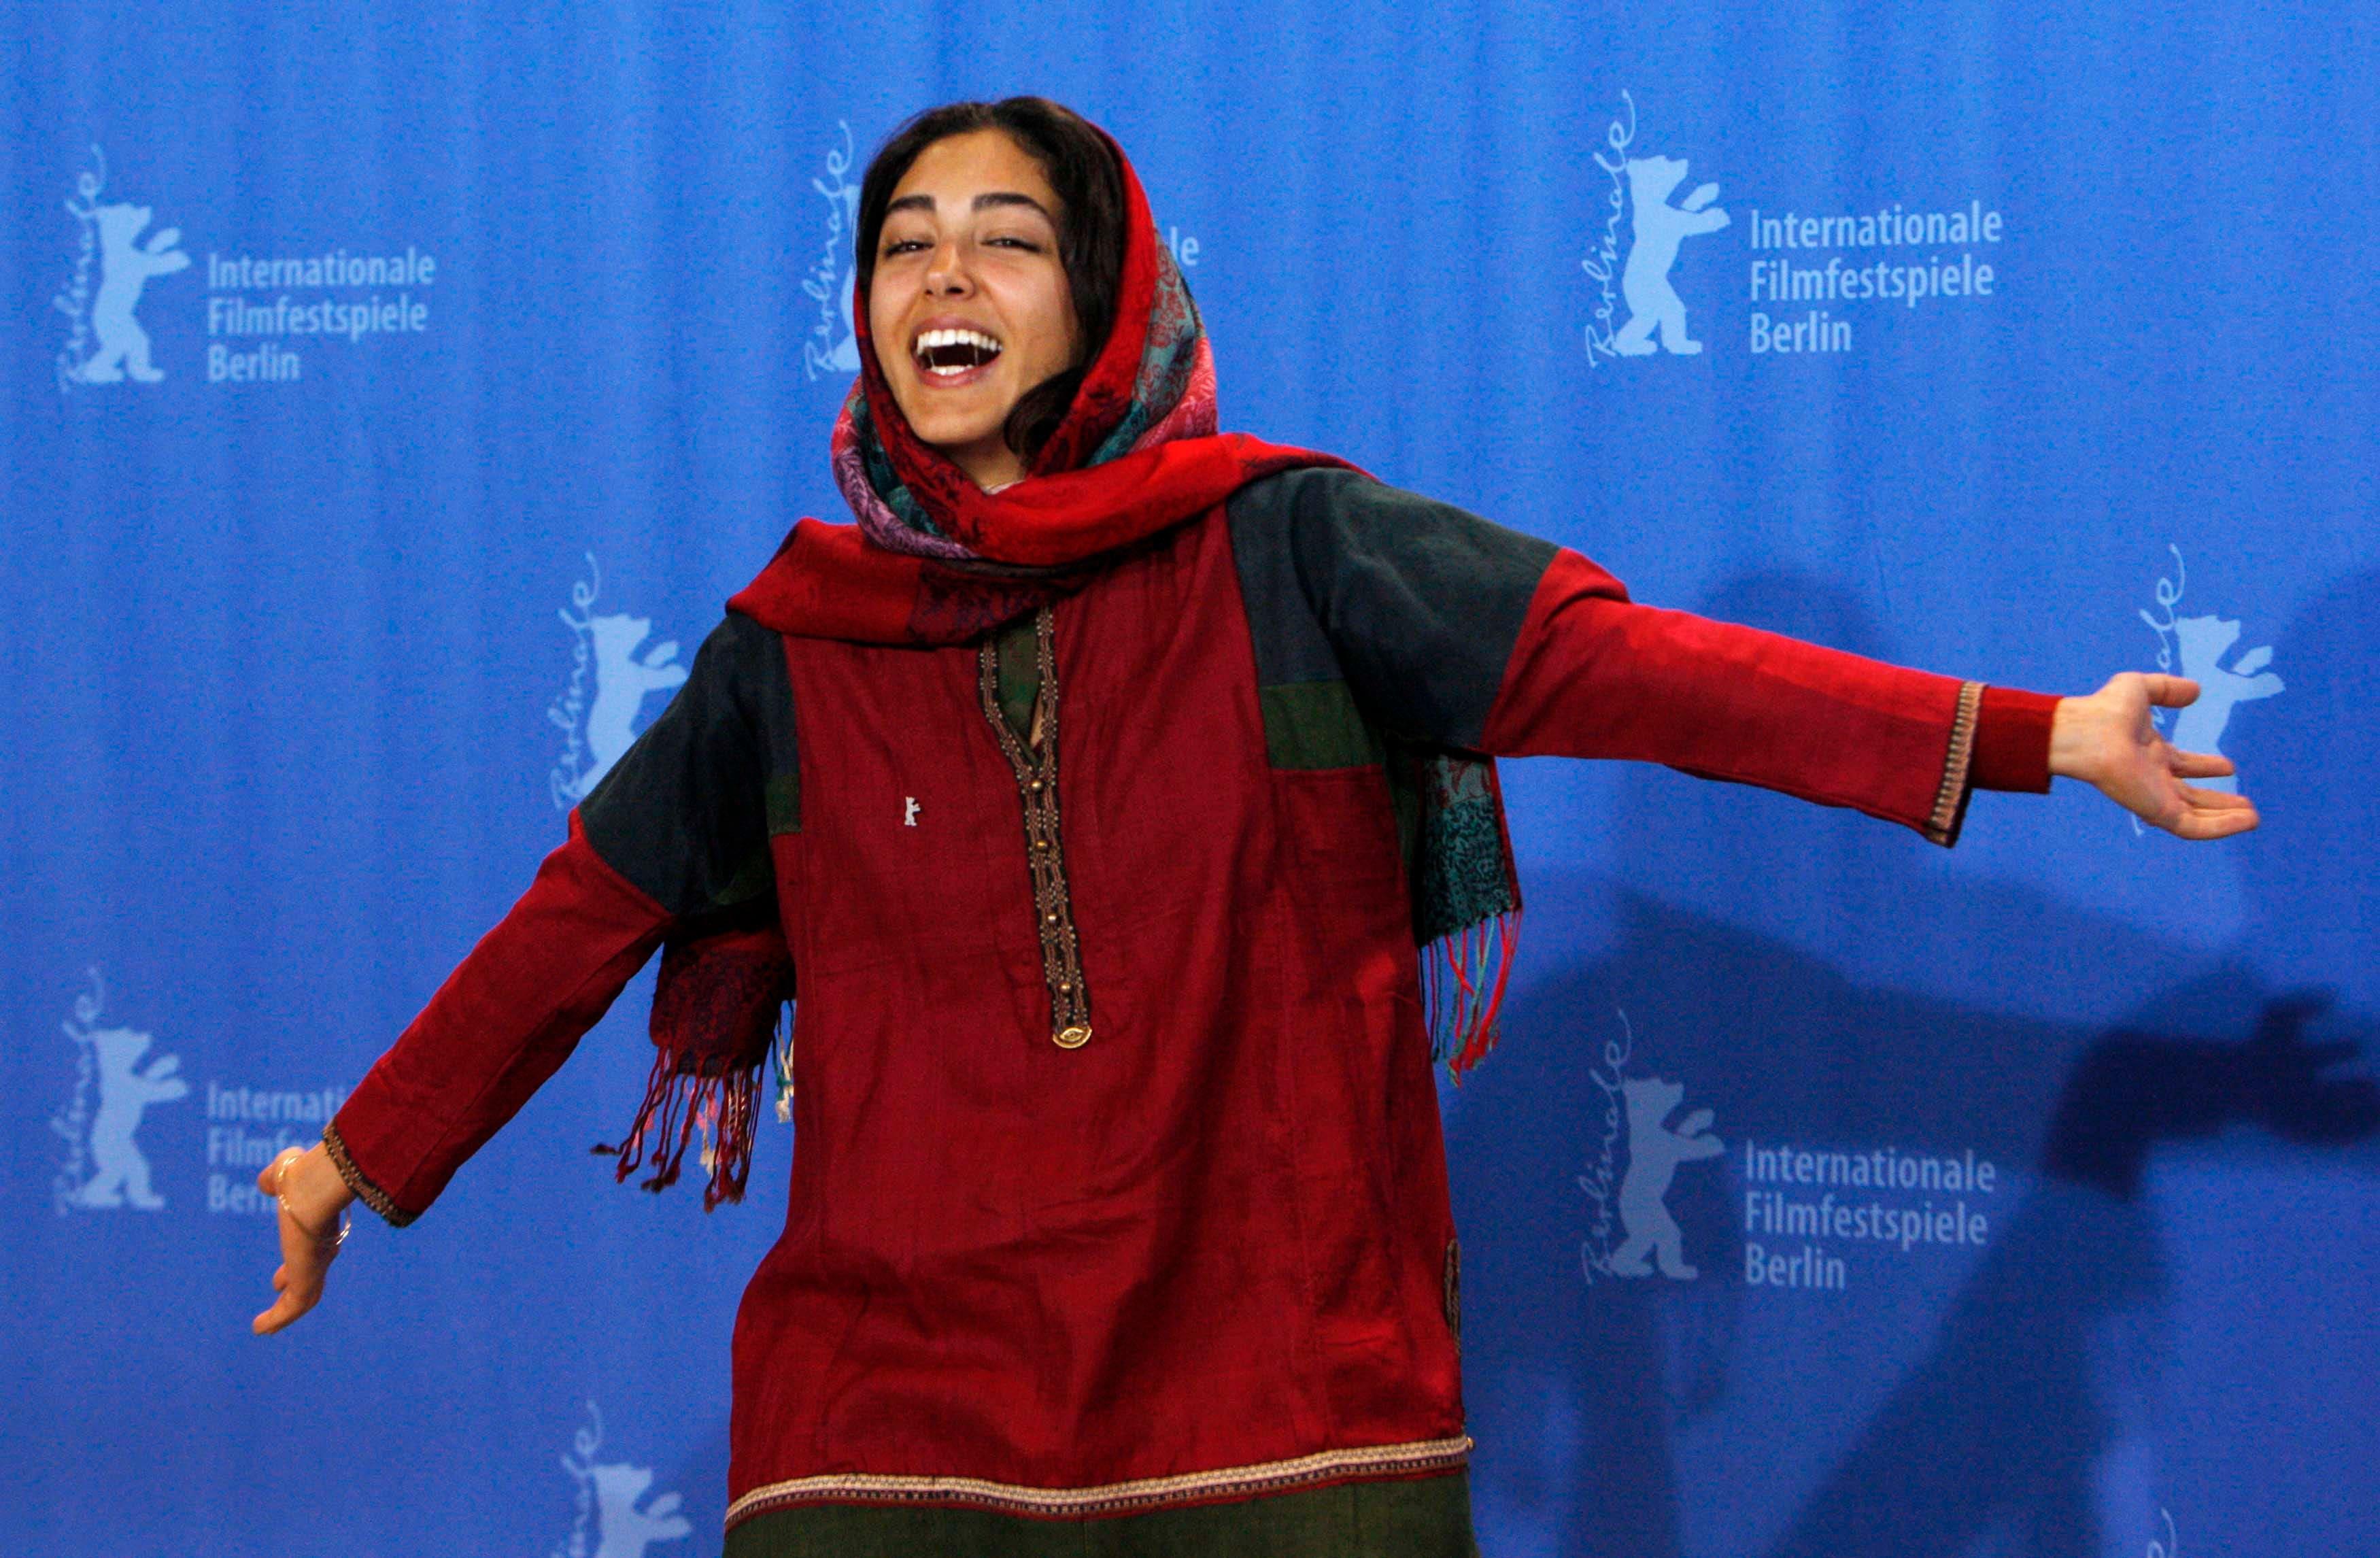 Iranian Actress Golshifteh Farahani In Trouble For Nude Photo Shoot Fox News Golshifteh Farahani News Newslocker